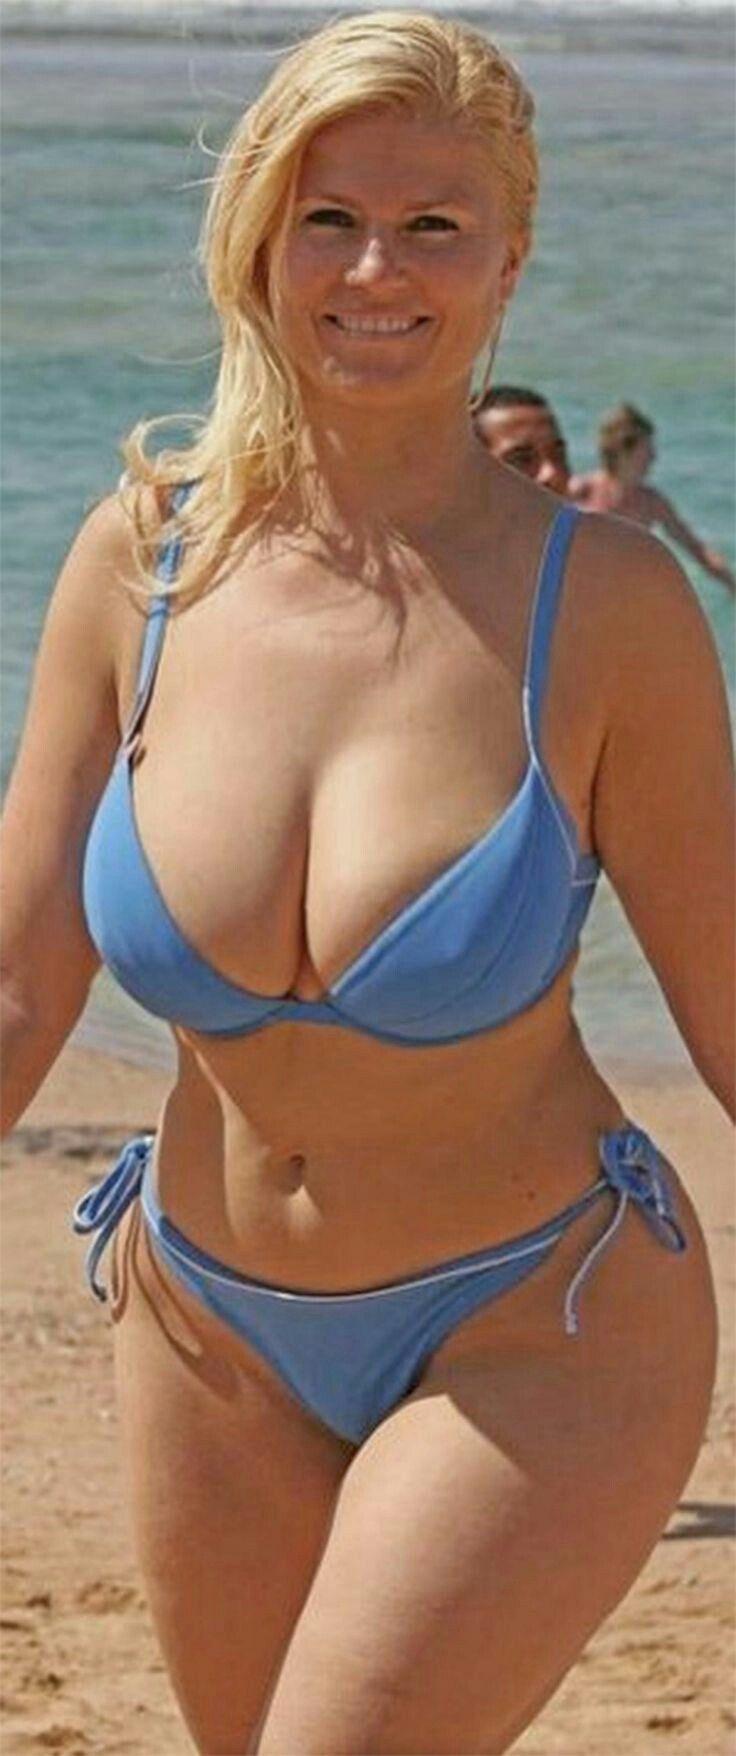 Caribe sexo rubio